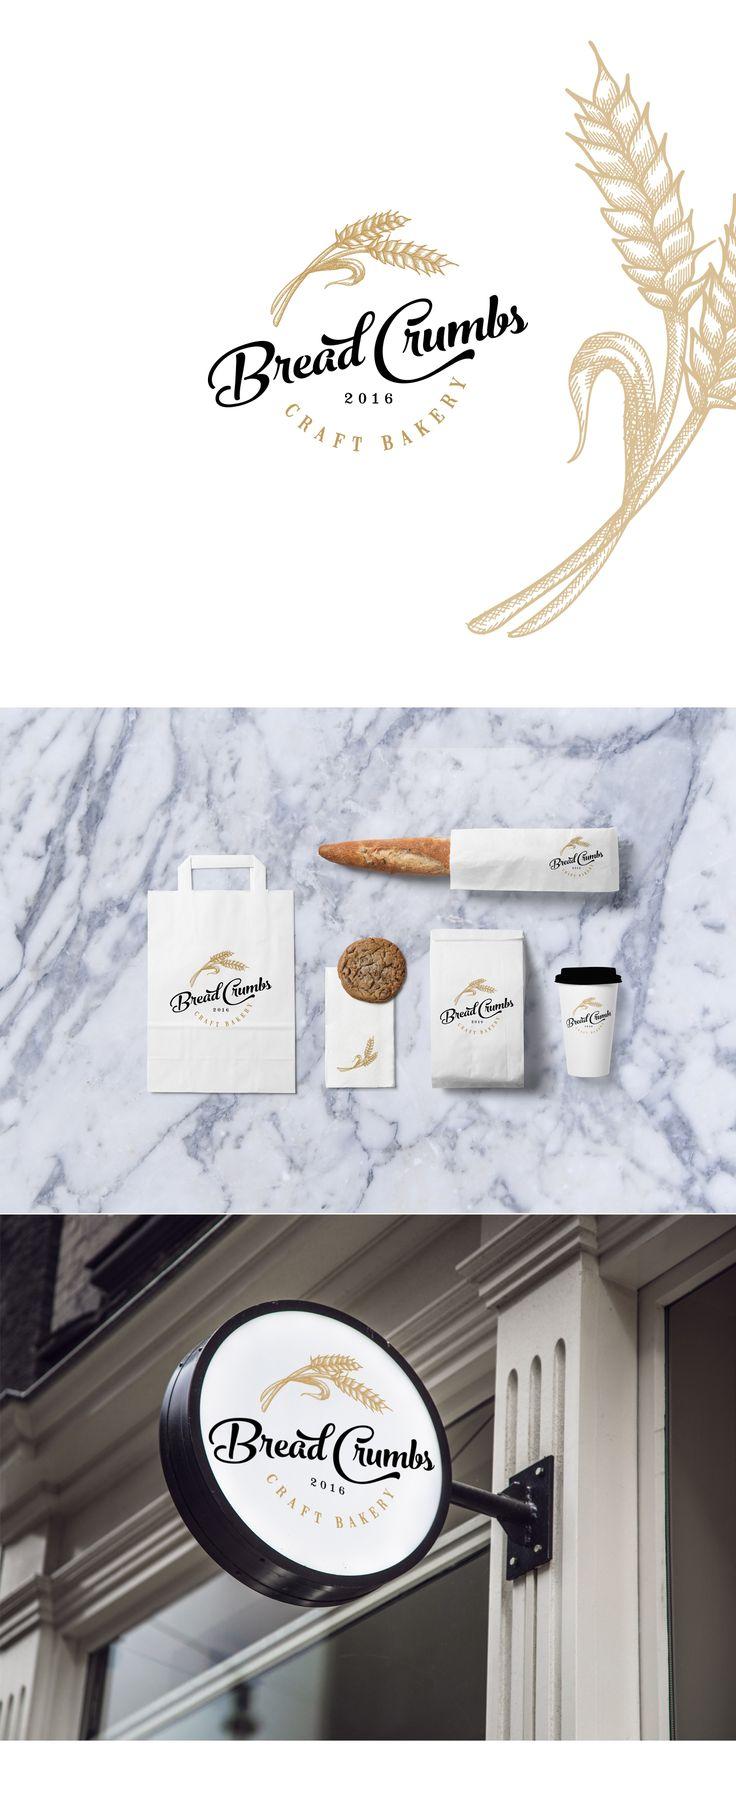 https://99designs.com/logo-design/contests/design-modern-hip-bread-bakery-logo-670240/entries/33